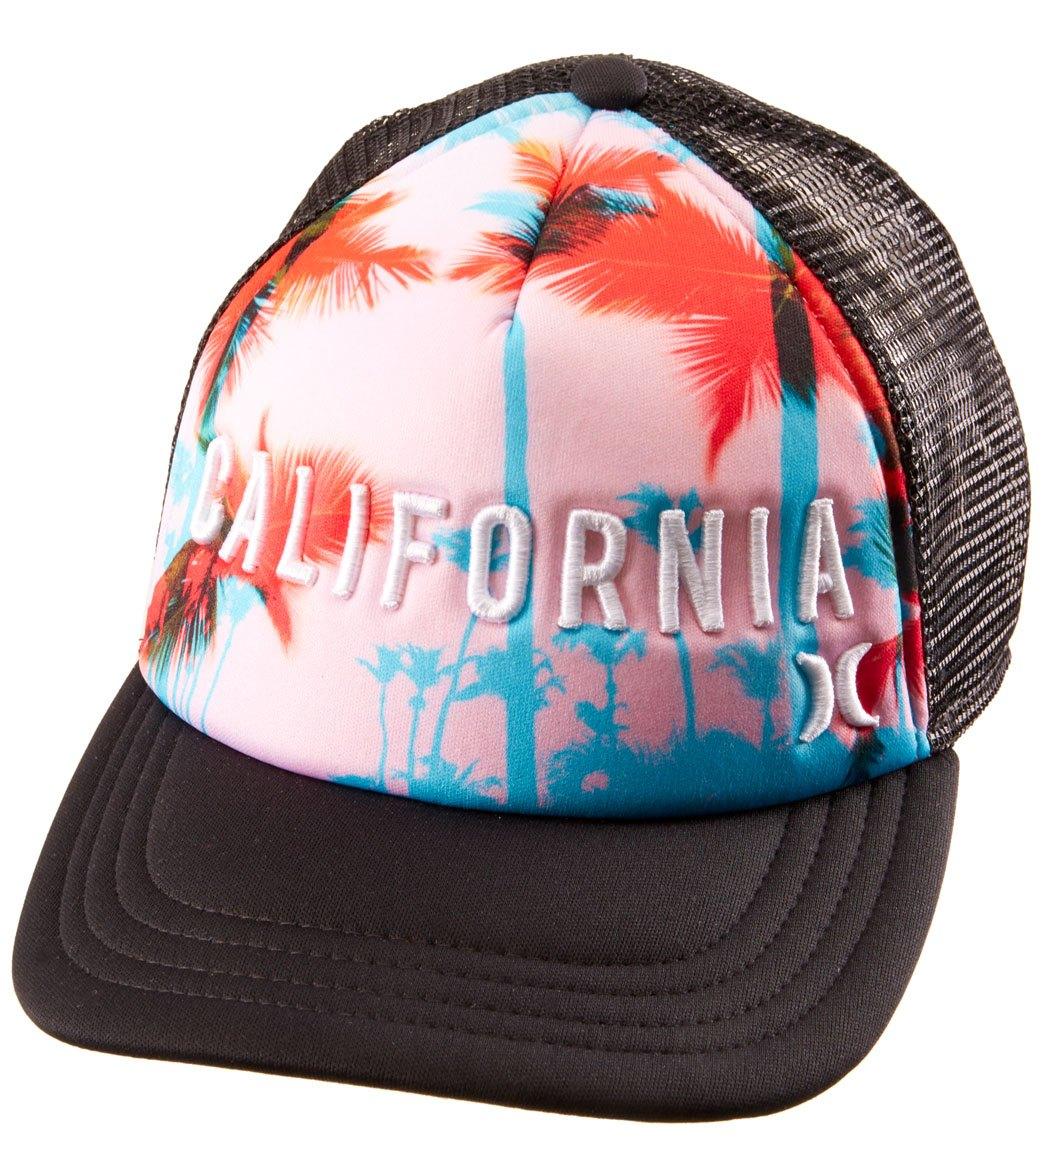 8aaaafdfe143b Hurley Cali Trucker Hat at SwimOutlet.com